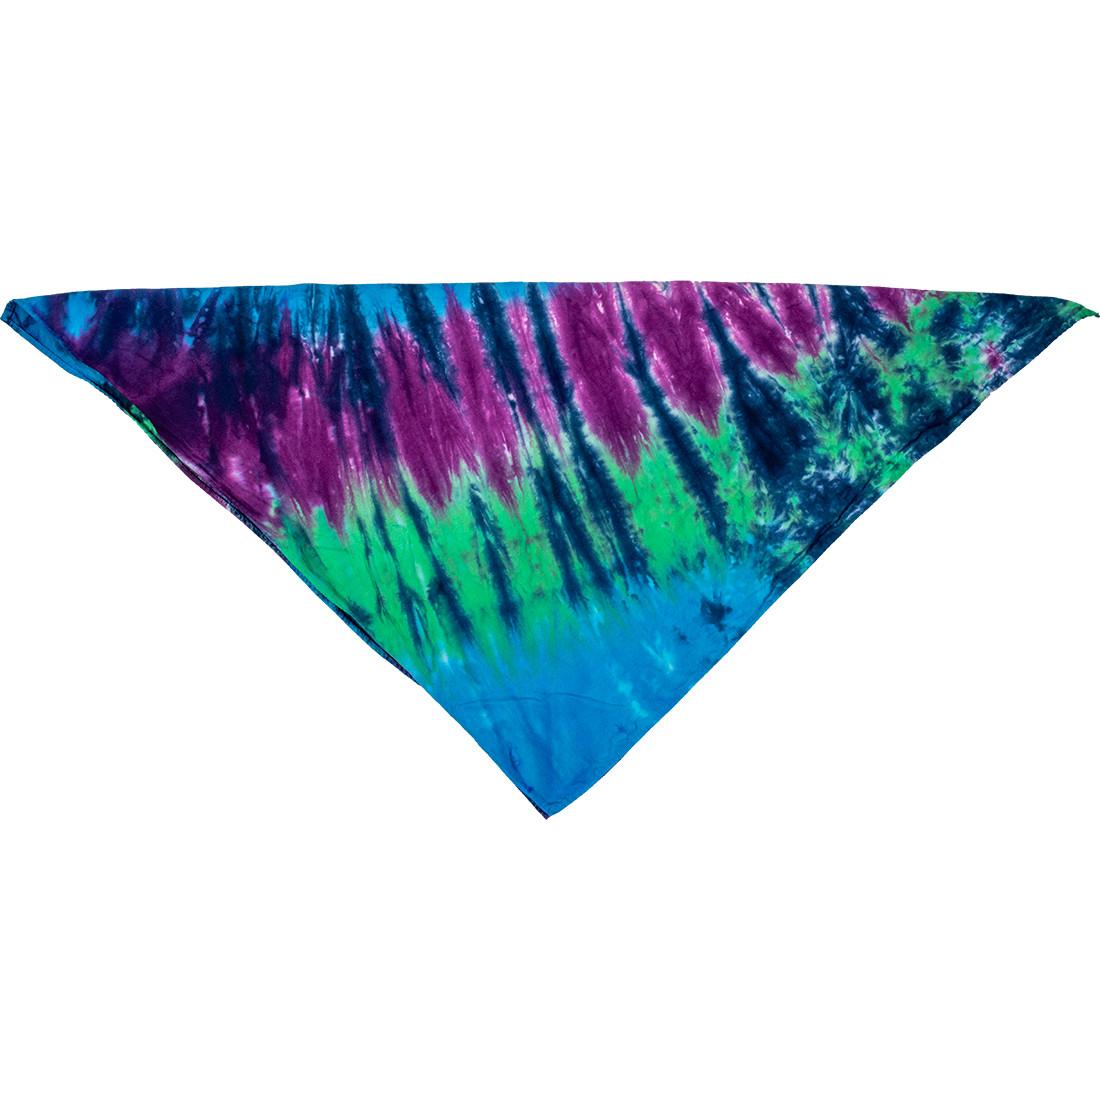 Cool Spiral Streak Tie-Dye Bandana